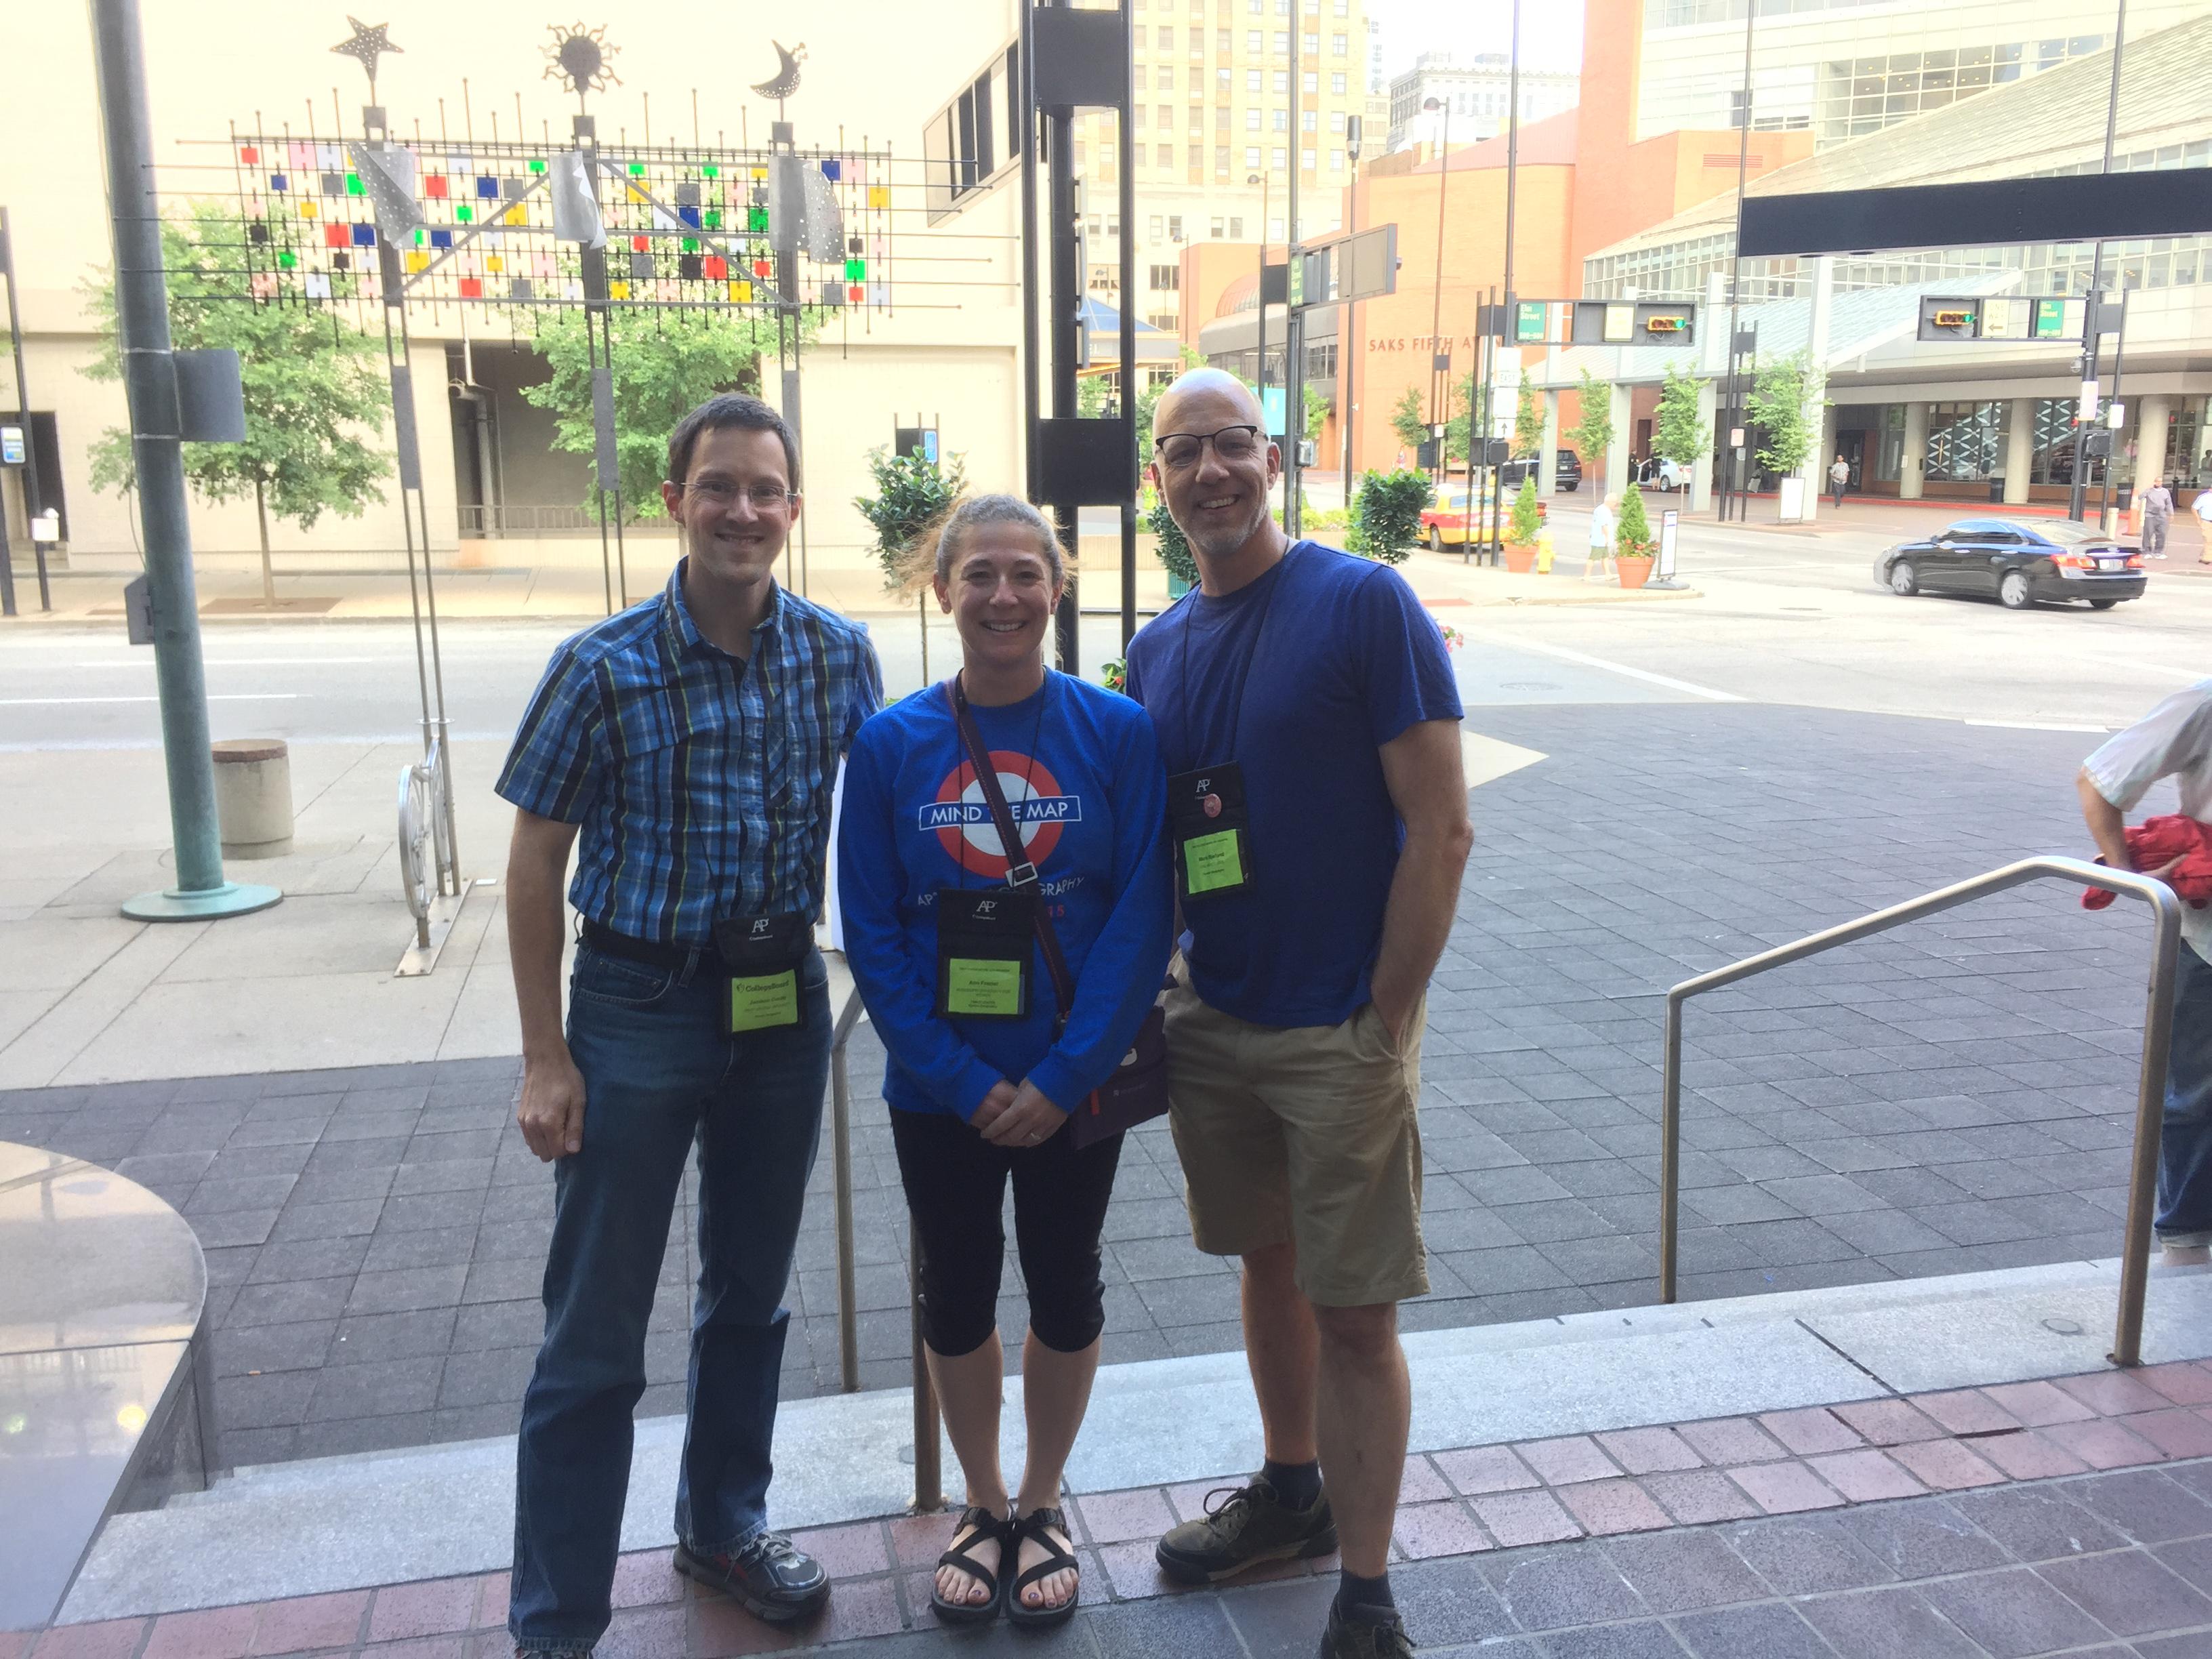 Geographers in Cincinnati